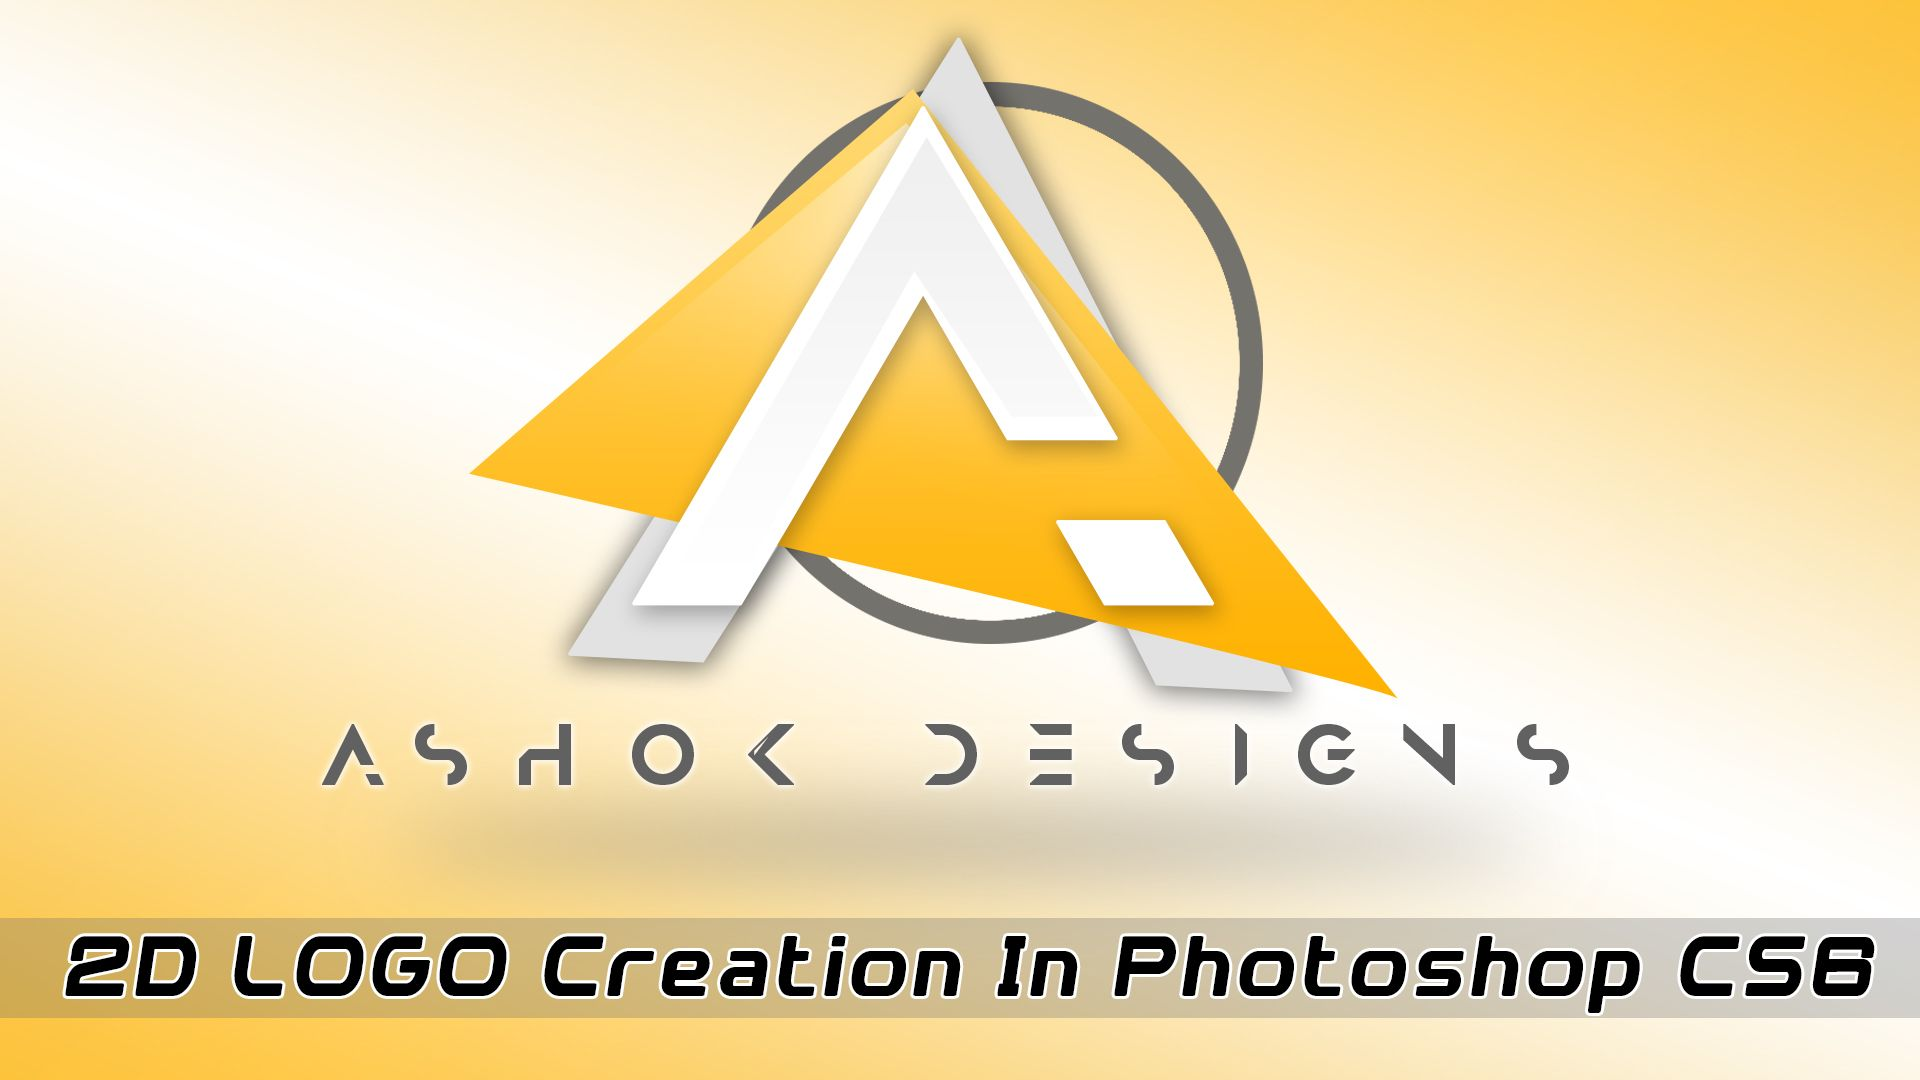 Tutoria for corporate logo design 3d text in photoshop 70 tutoria for corporate logo design baditri Gallery